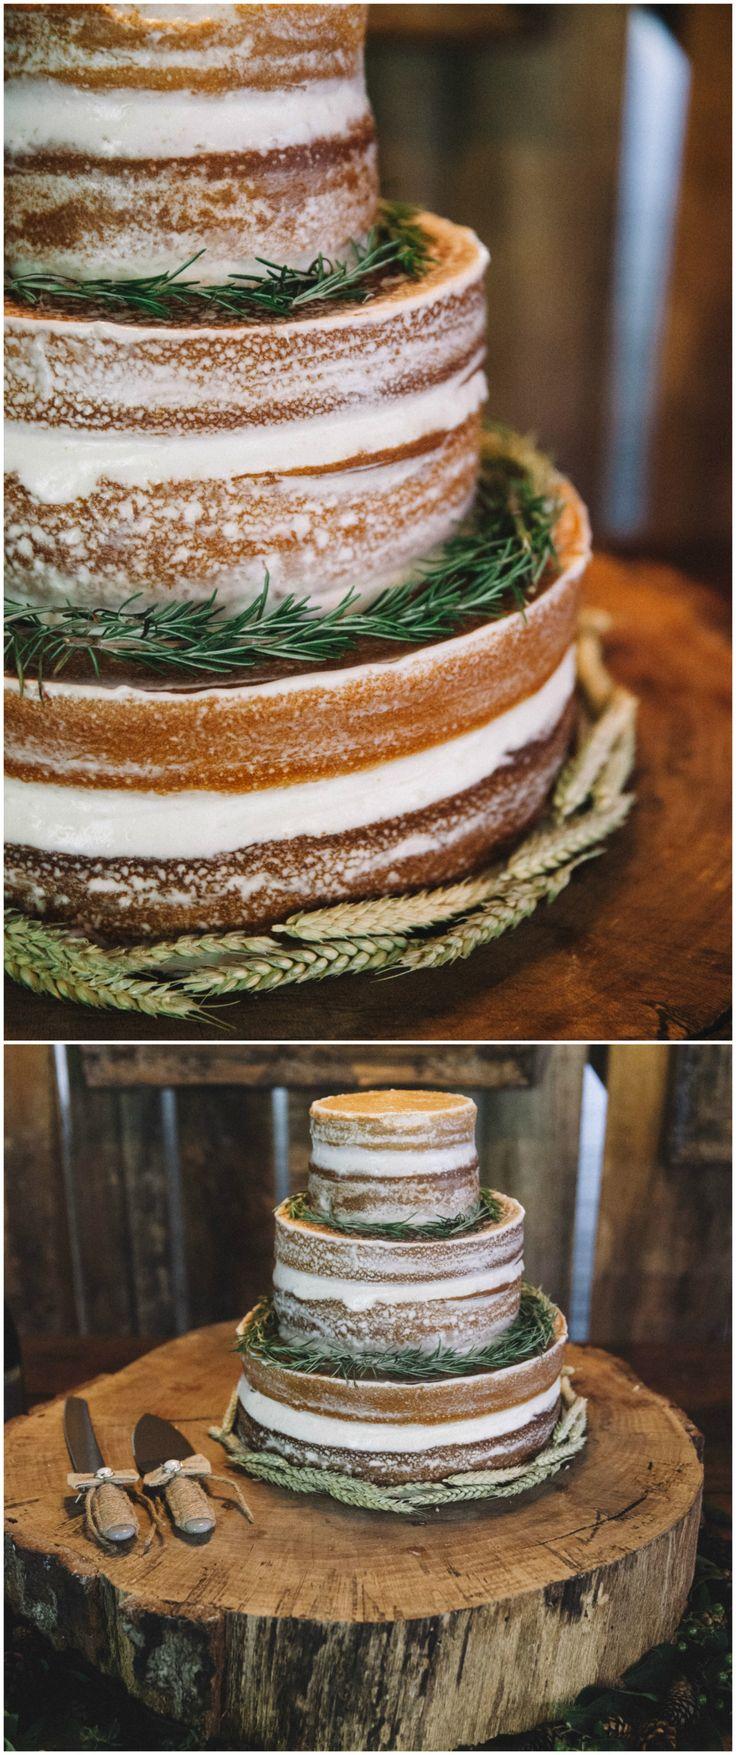 Natural wedding cake, naked cake, rustic cake stand, barn wedding reception dessert table, pine needles // Rachel Nichole Photography